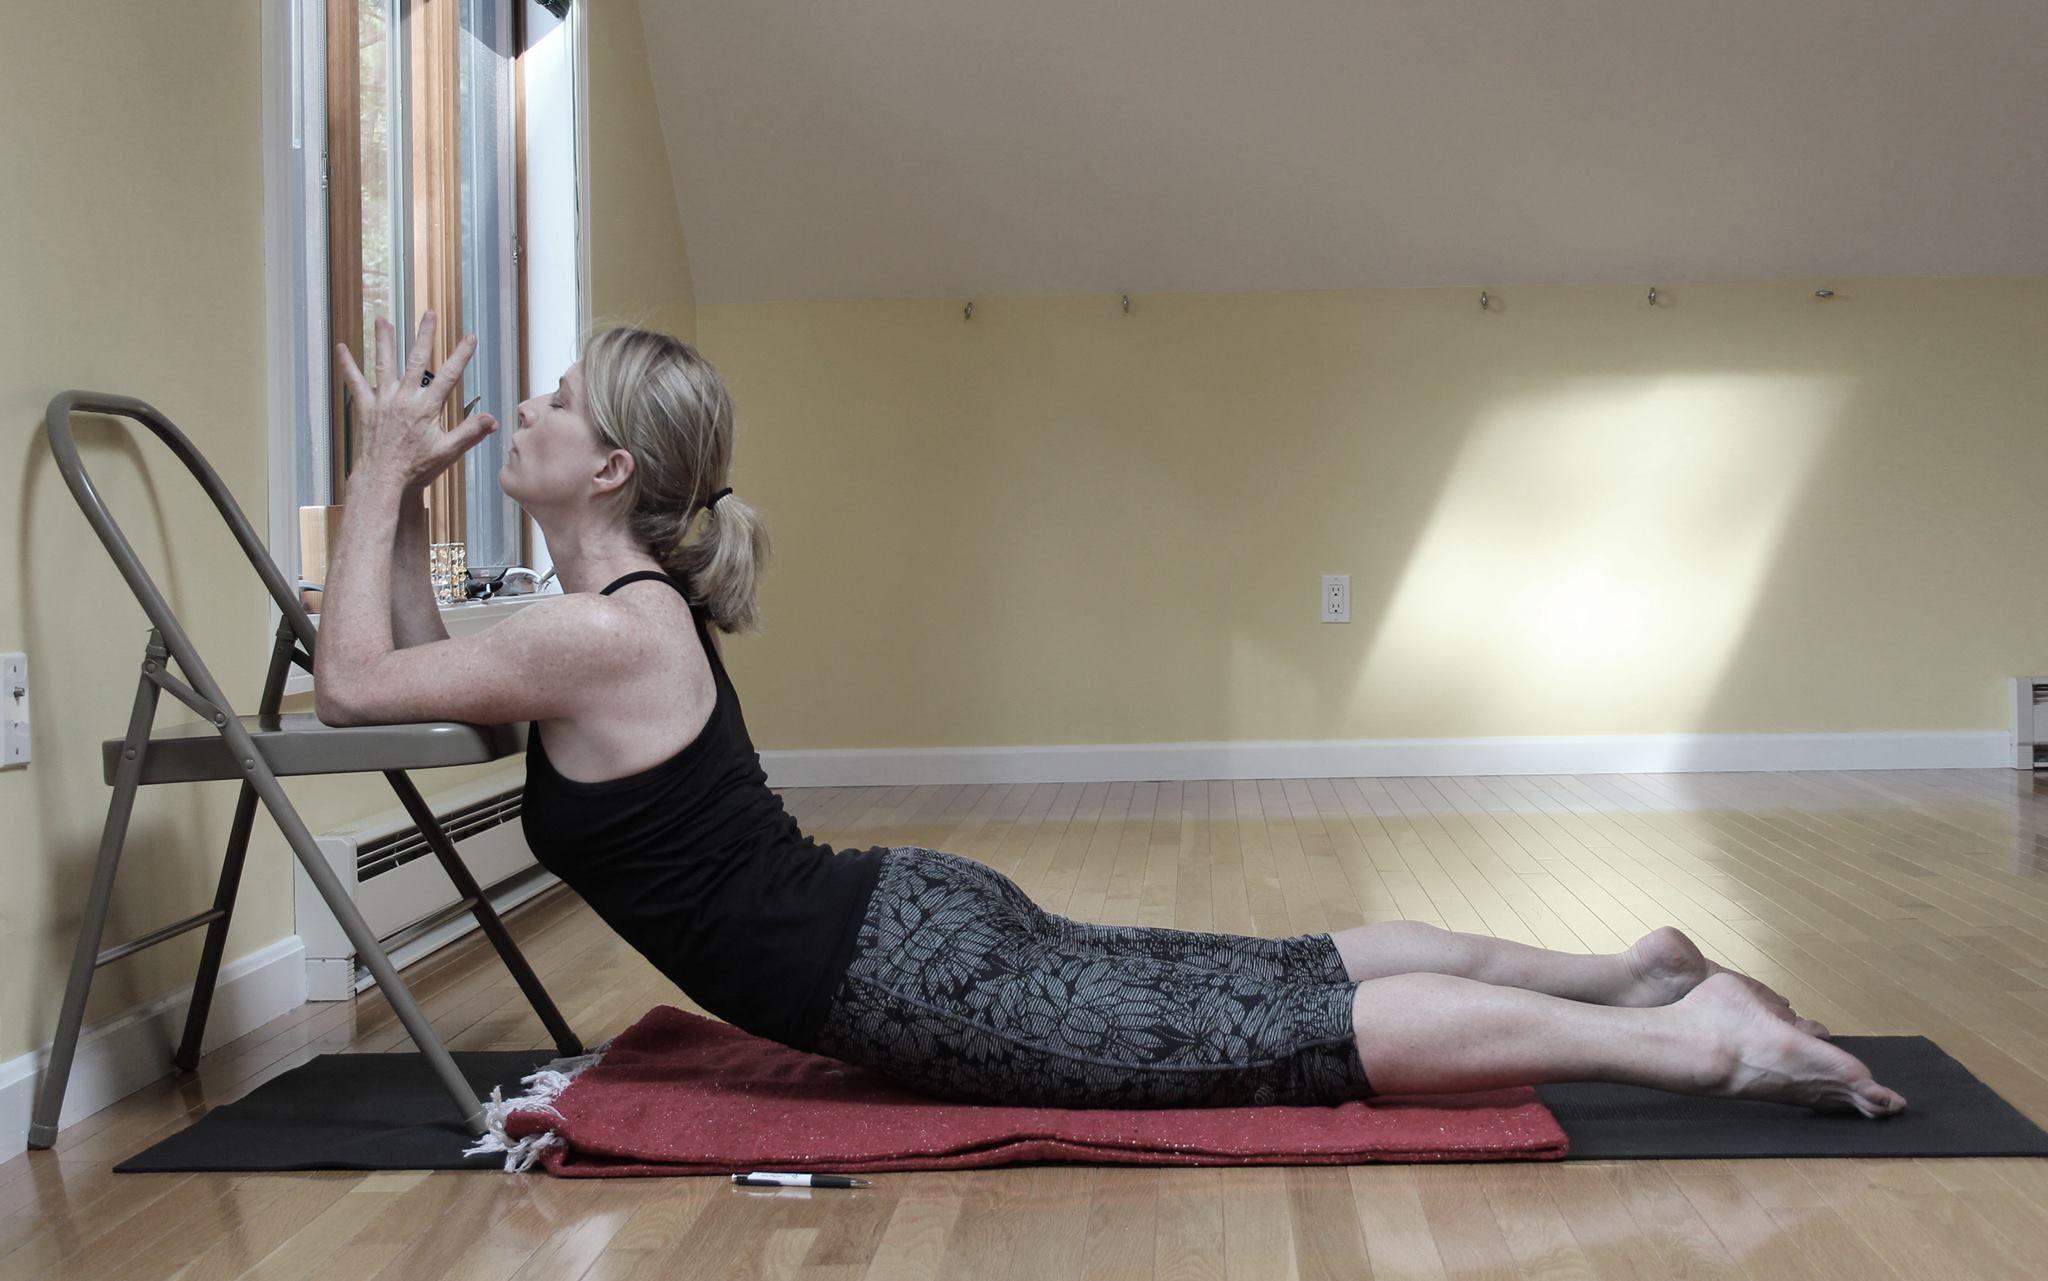 office chair yoga youtube cohesion gaming bhujangasana variation iyengar back bends